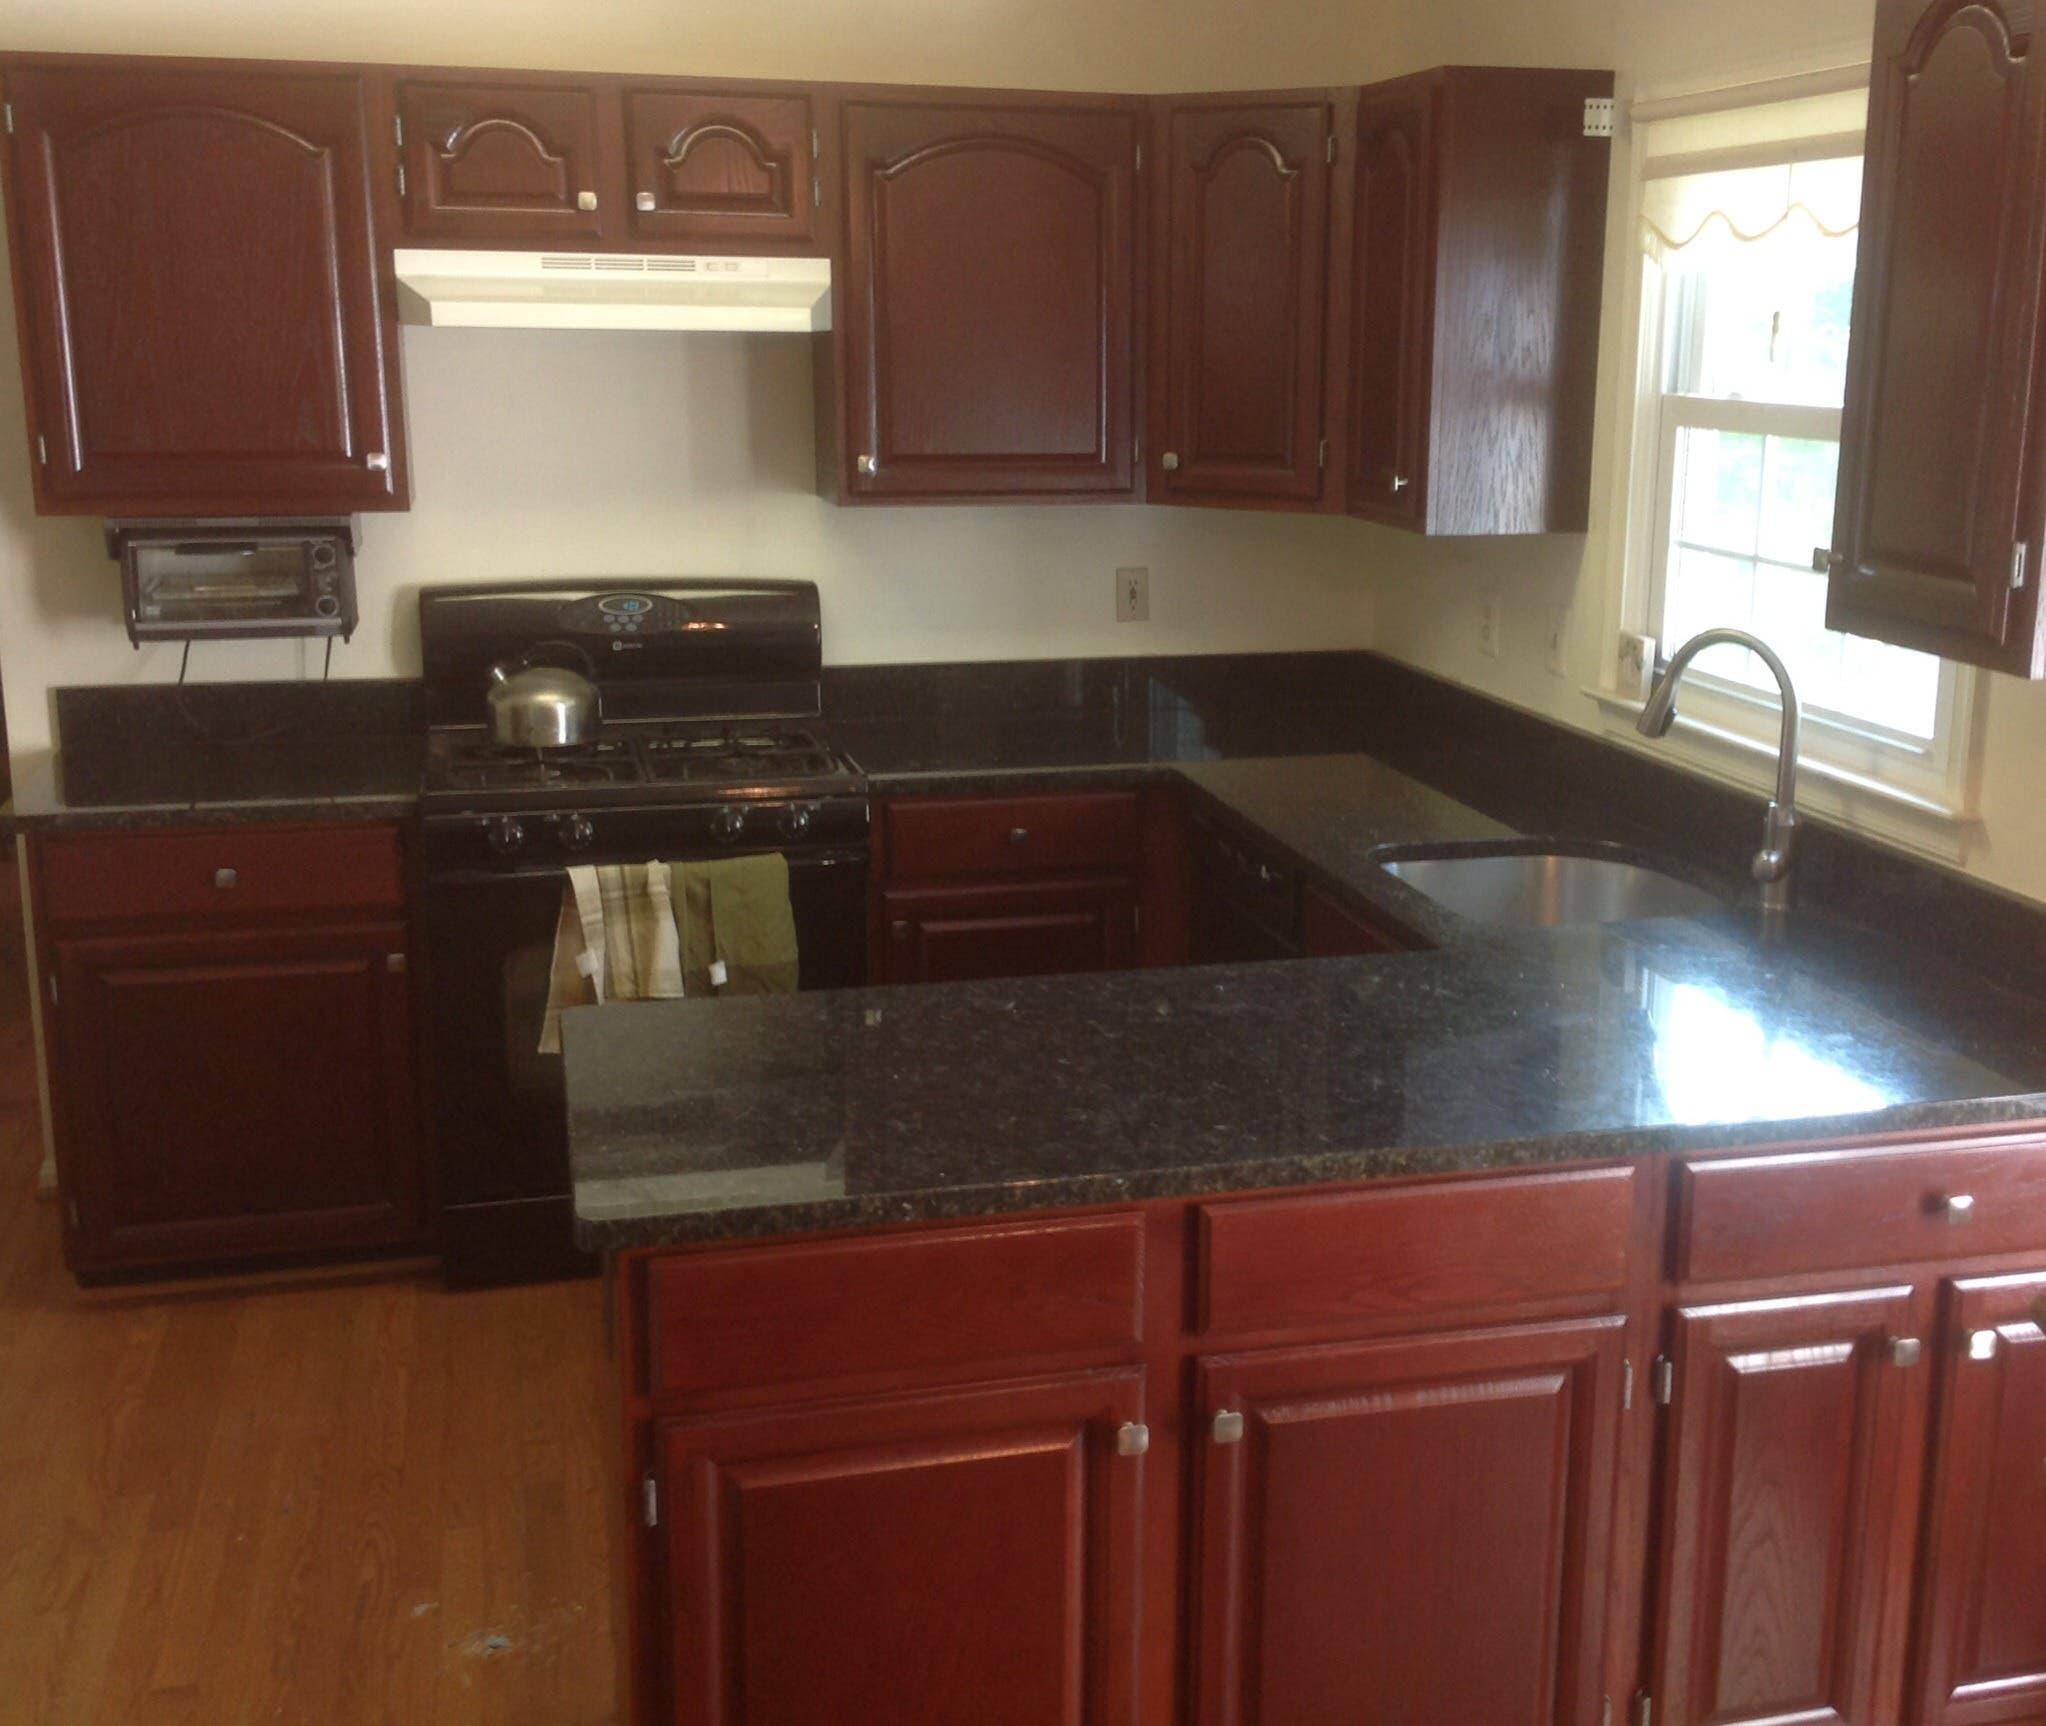 The SRY Group- Kitchens | Manassas Park, VA Patch